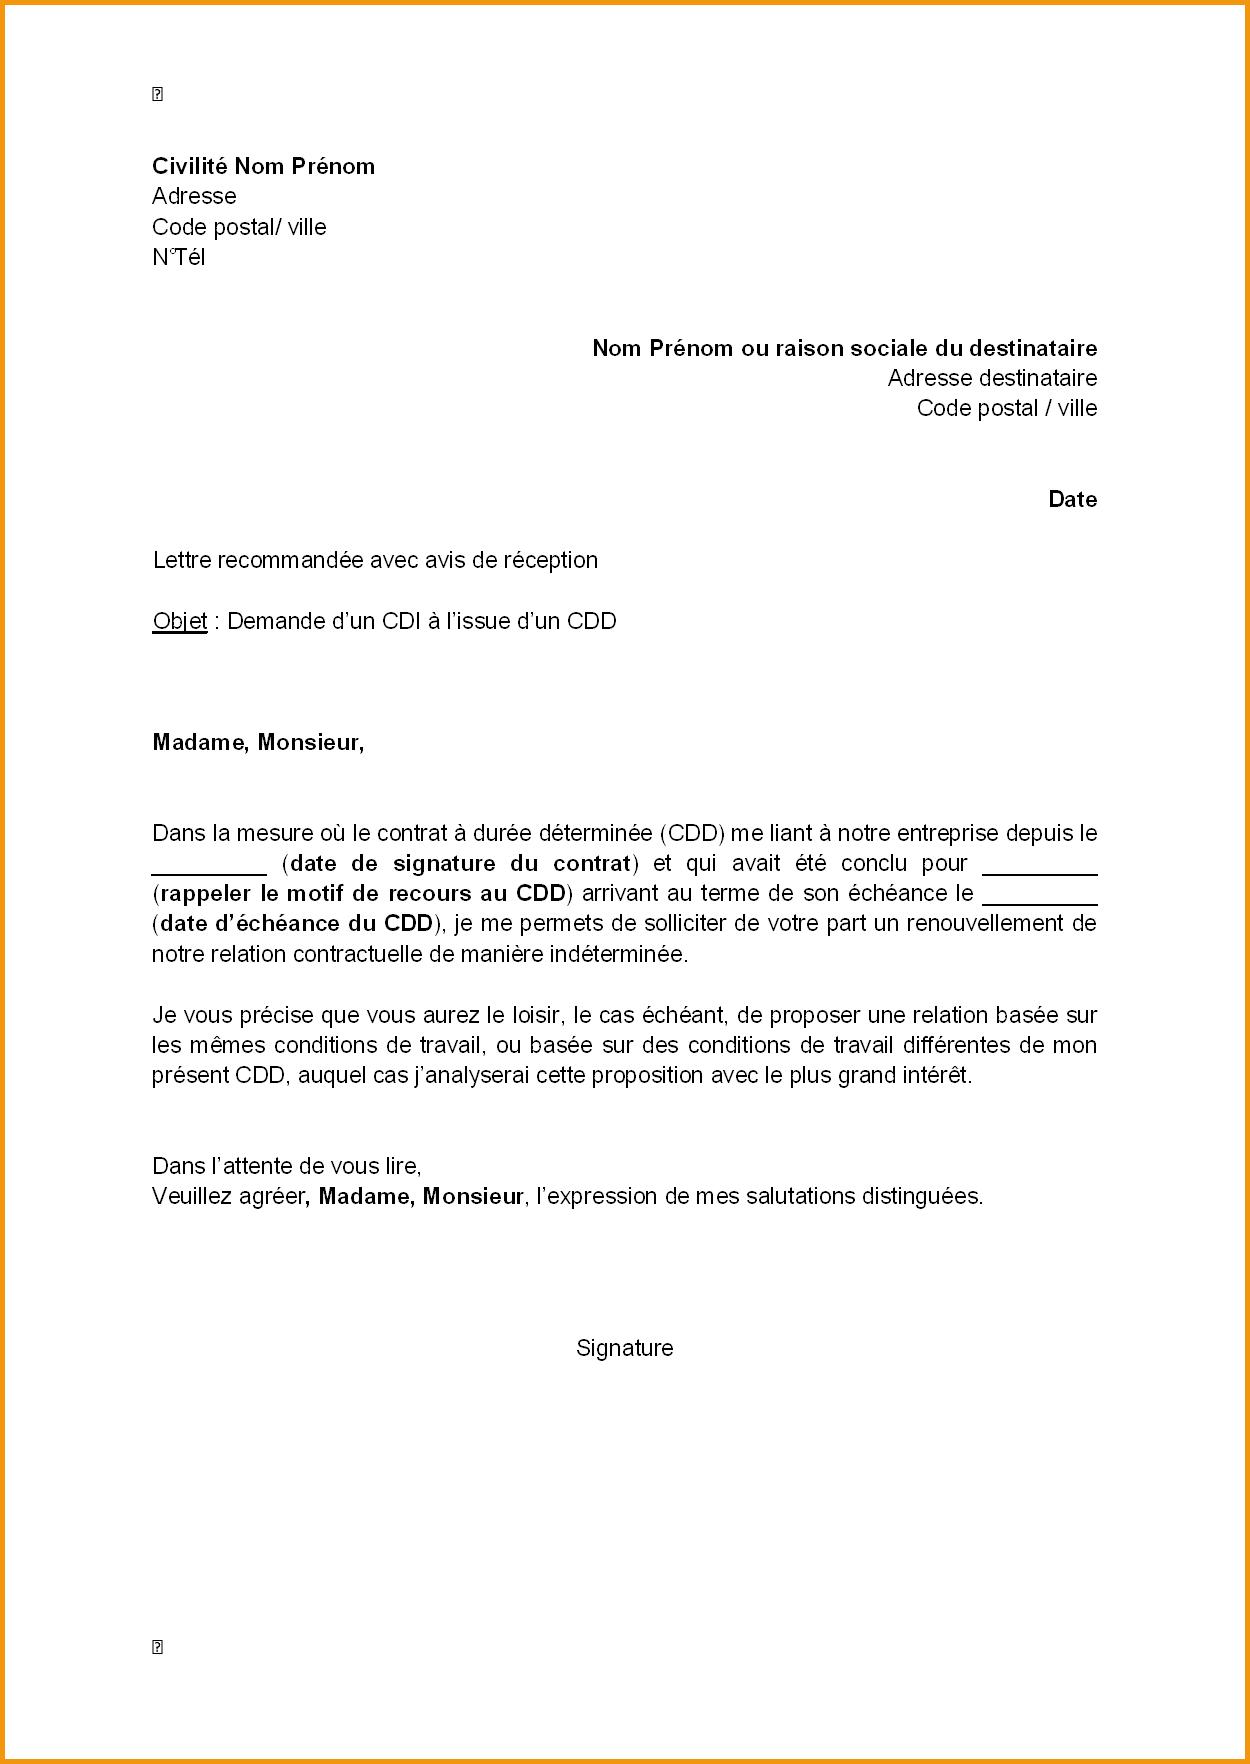 Lettre De Demande D Emploi Apercu Lettre De Demande D Un Cdi